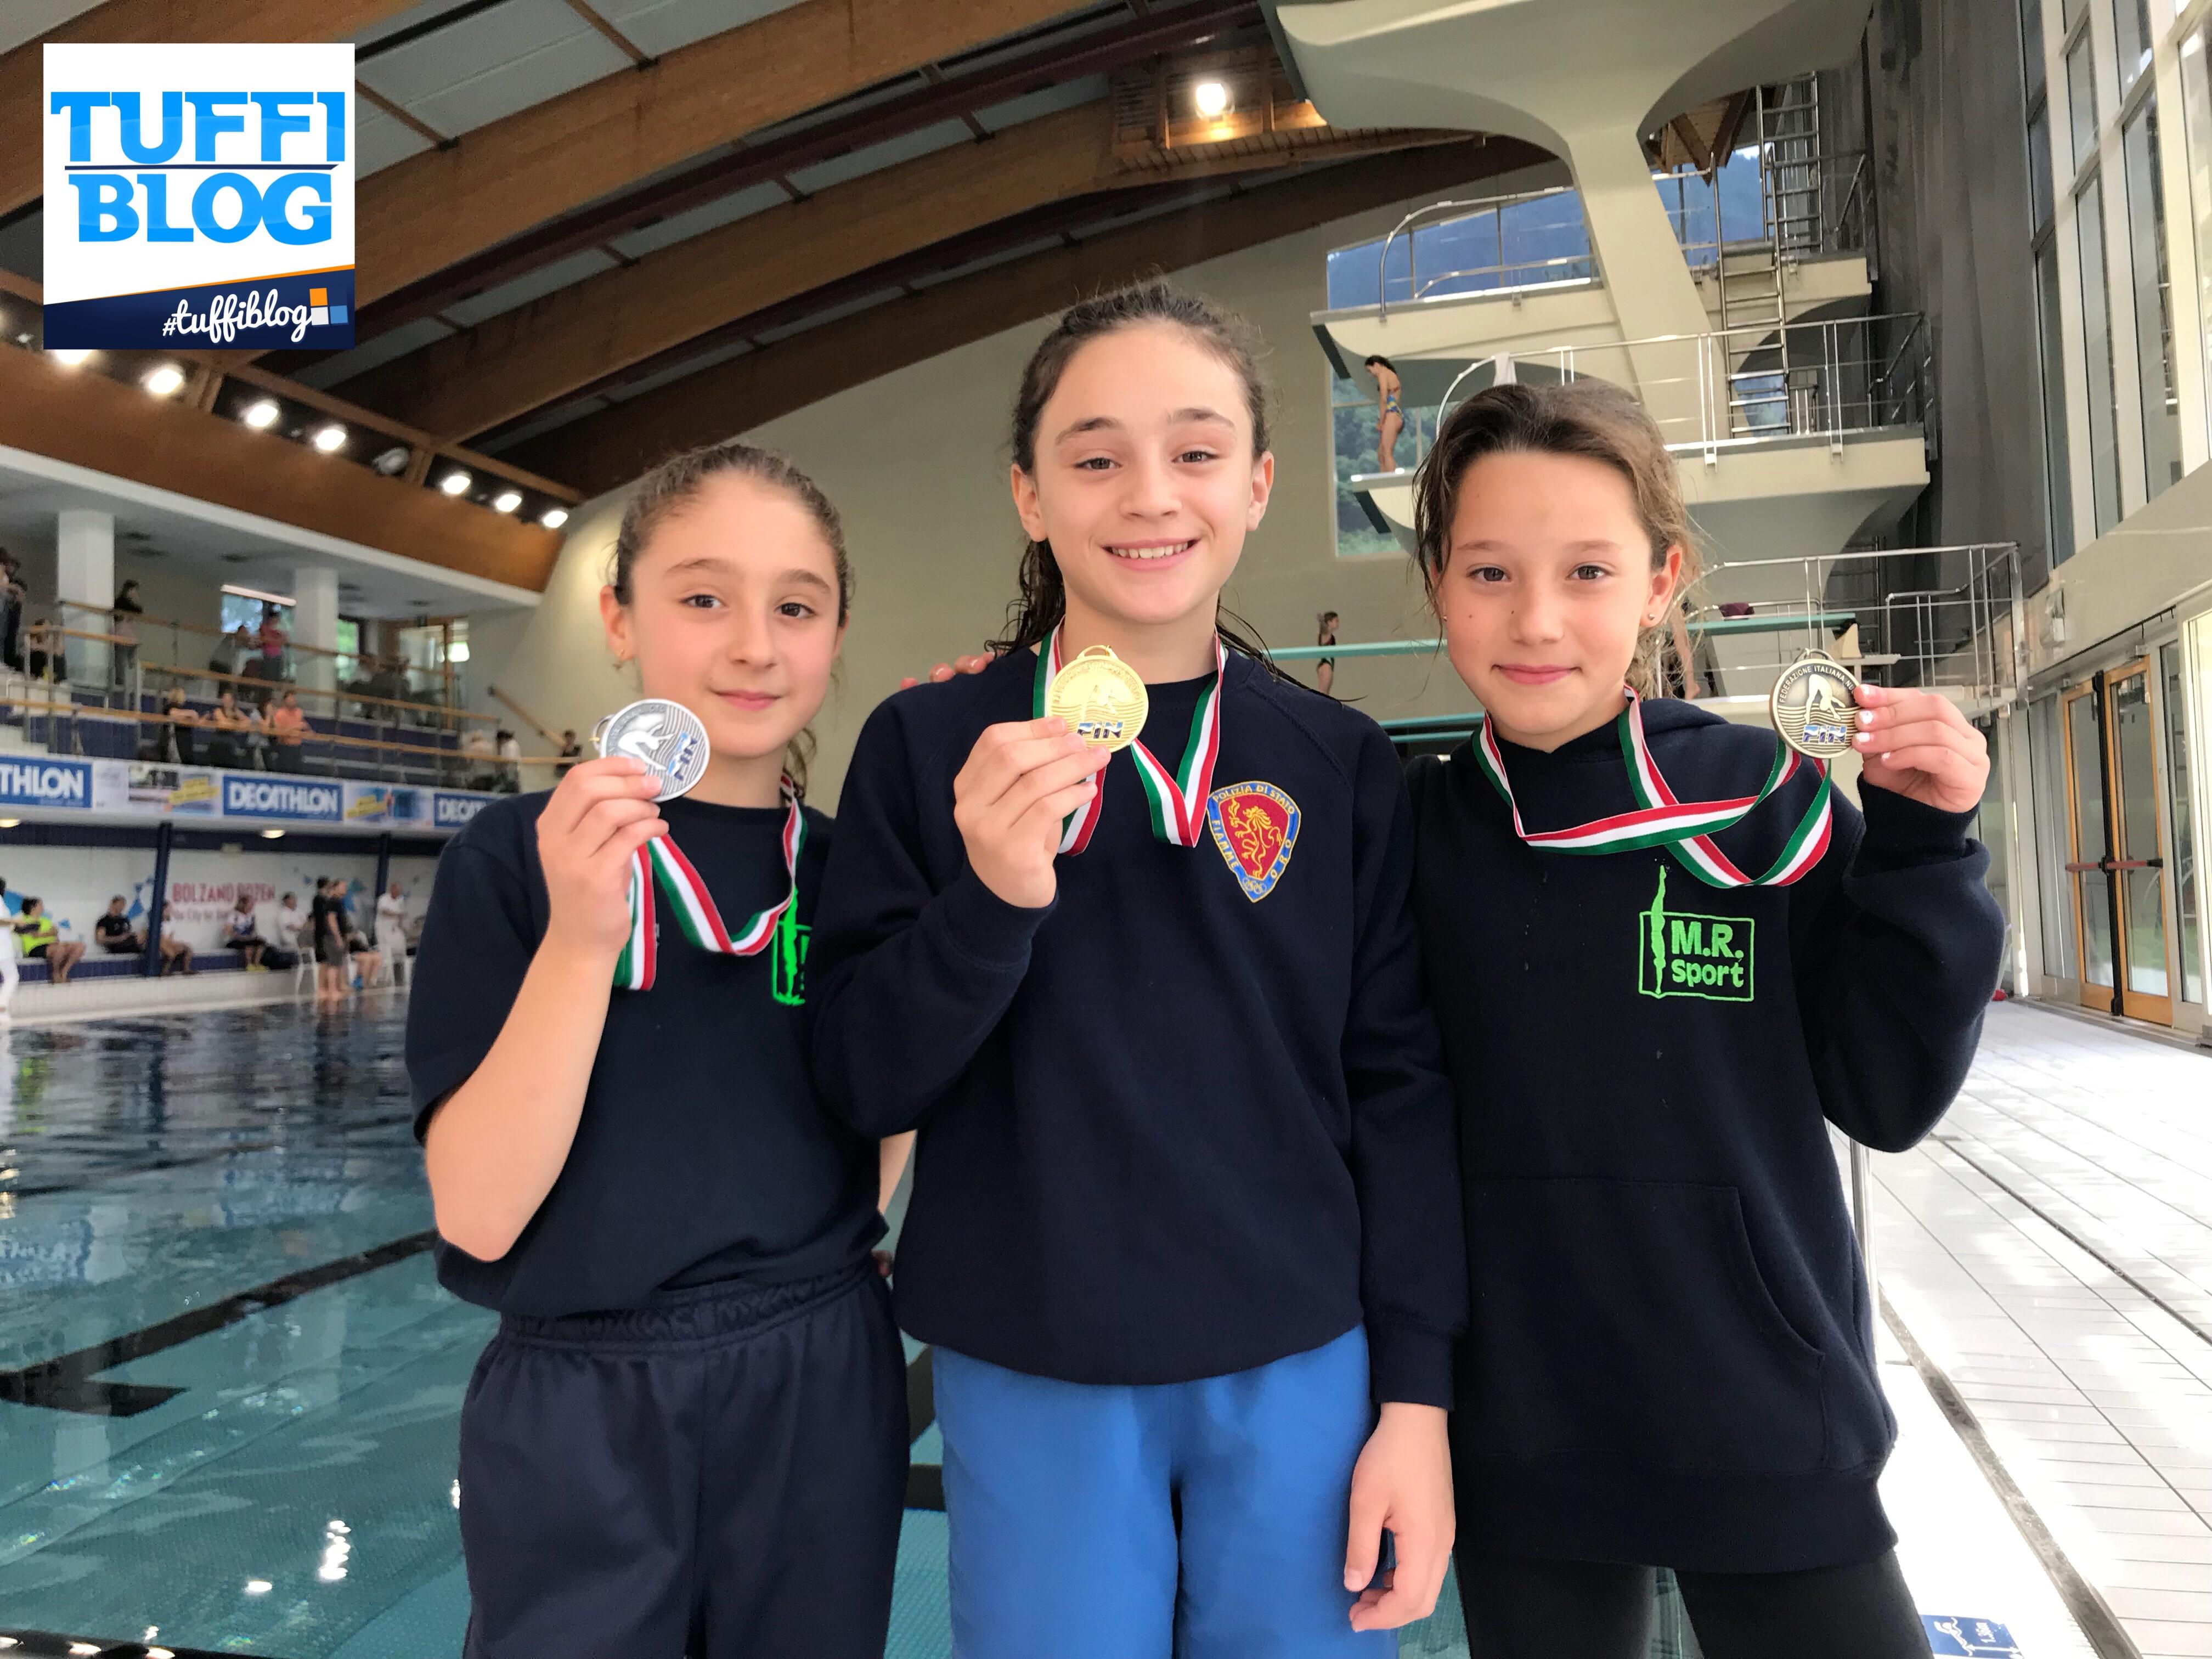 2ª Prova Trofeo Giovanissimi: Bolzano - I risultati della 1ª giornata.